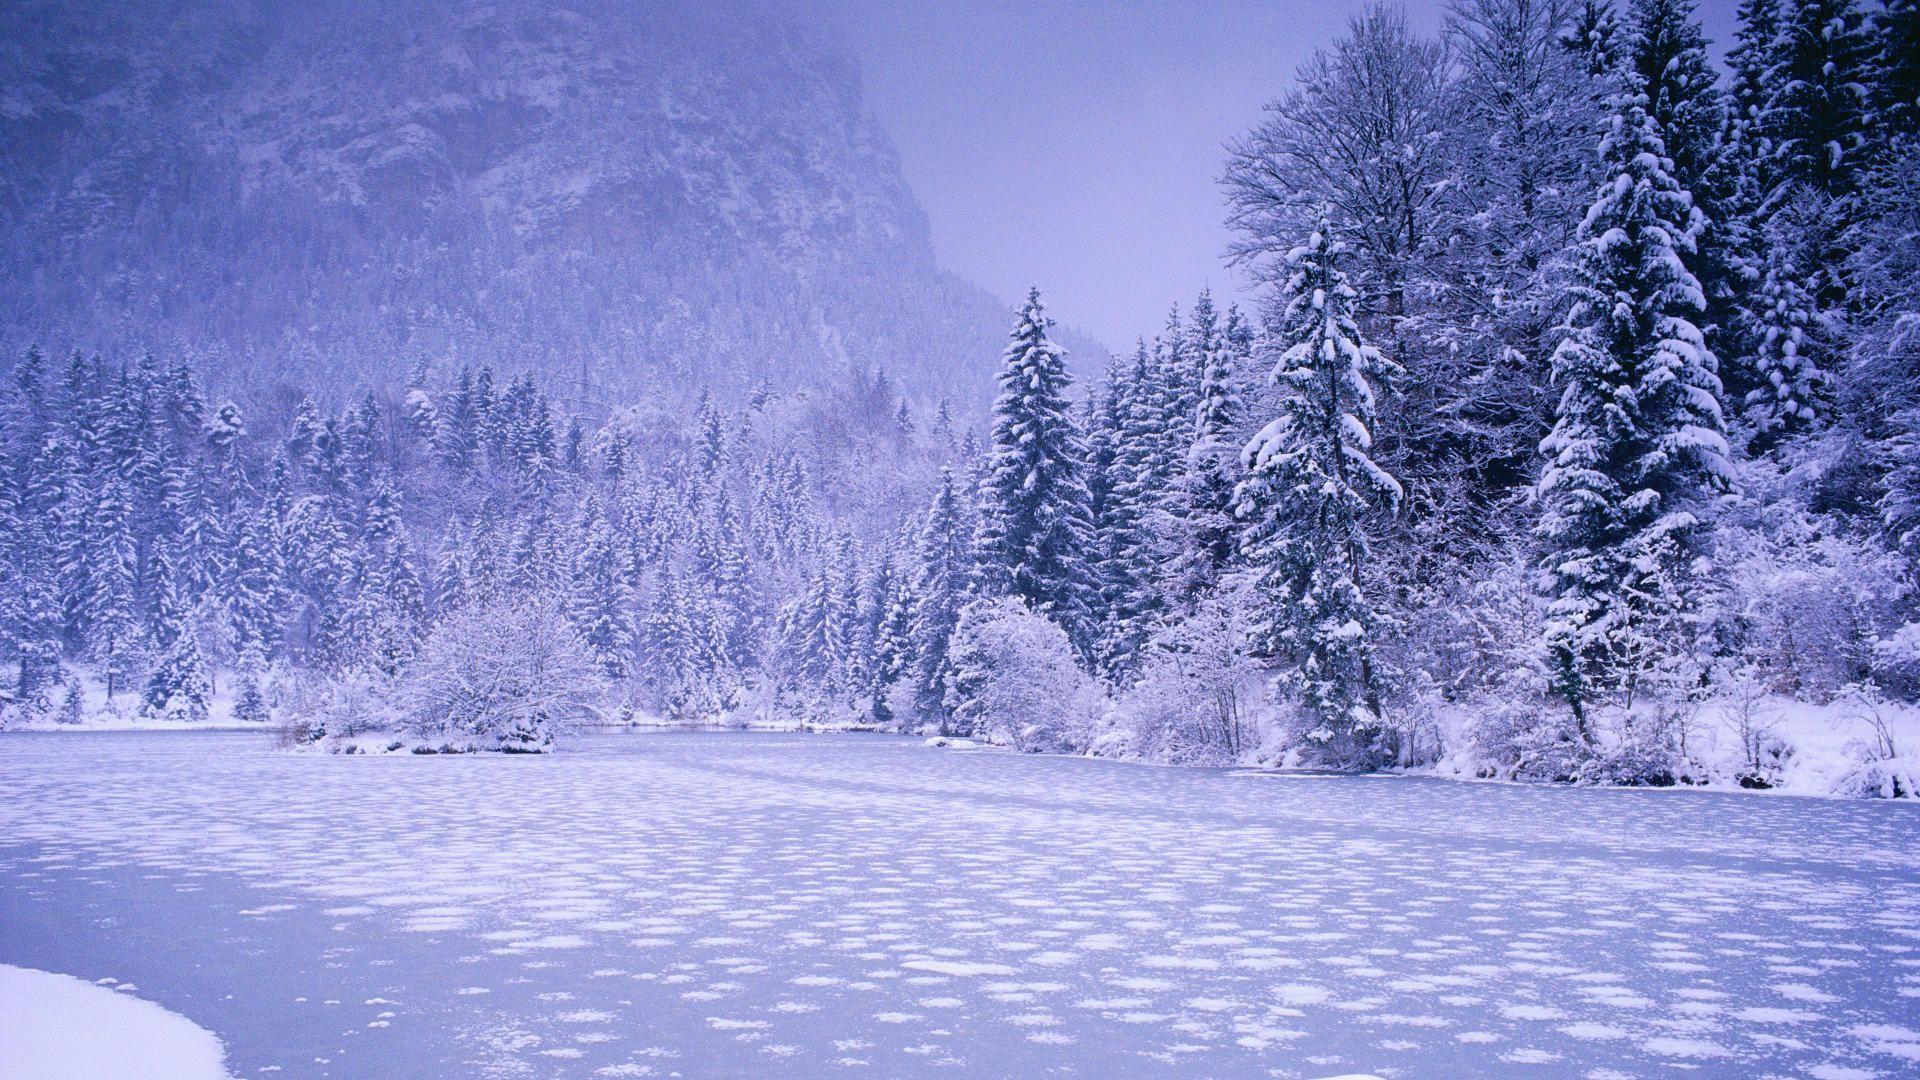 Popular Wallpaper High Quality Winter - 2a6b07210398cca93debe3e4bf814522  Picture_375438.jpg